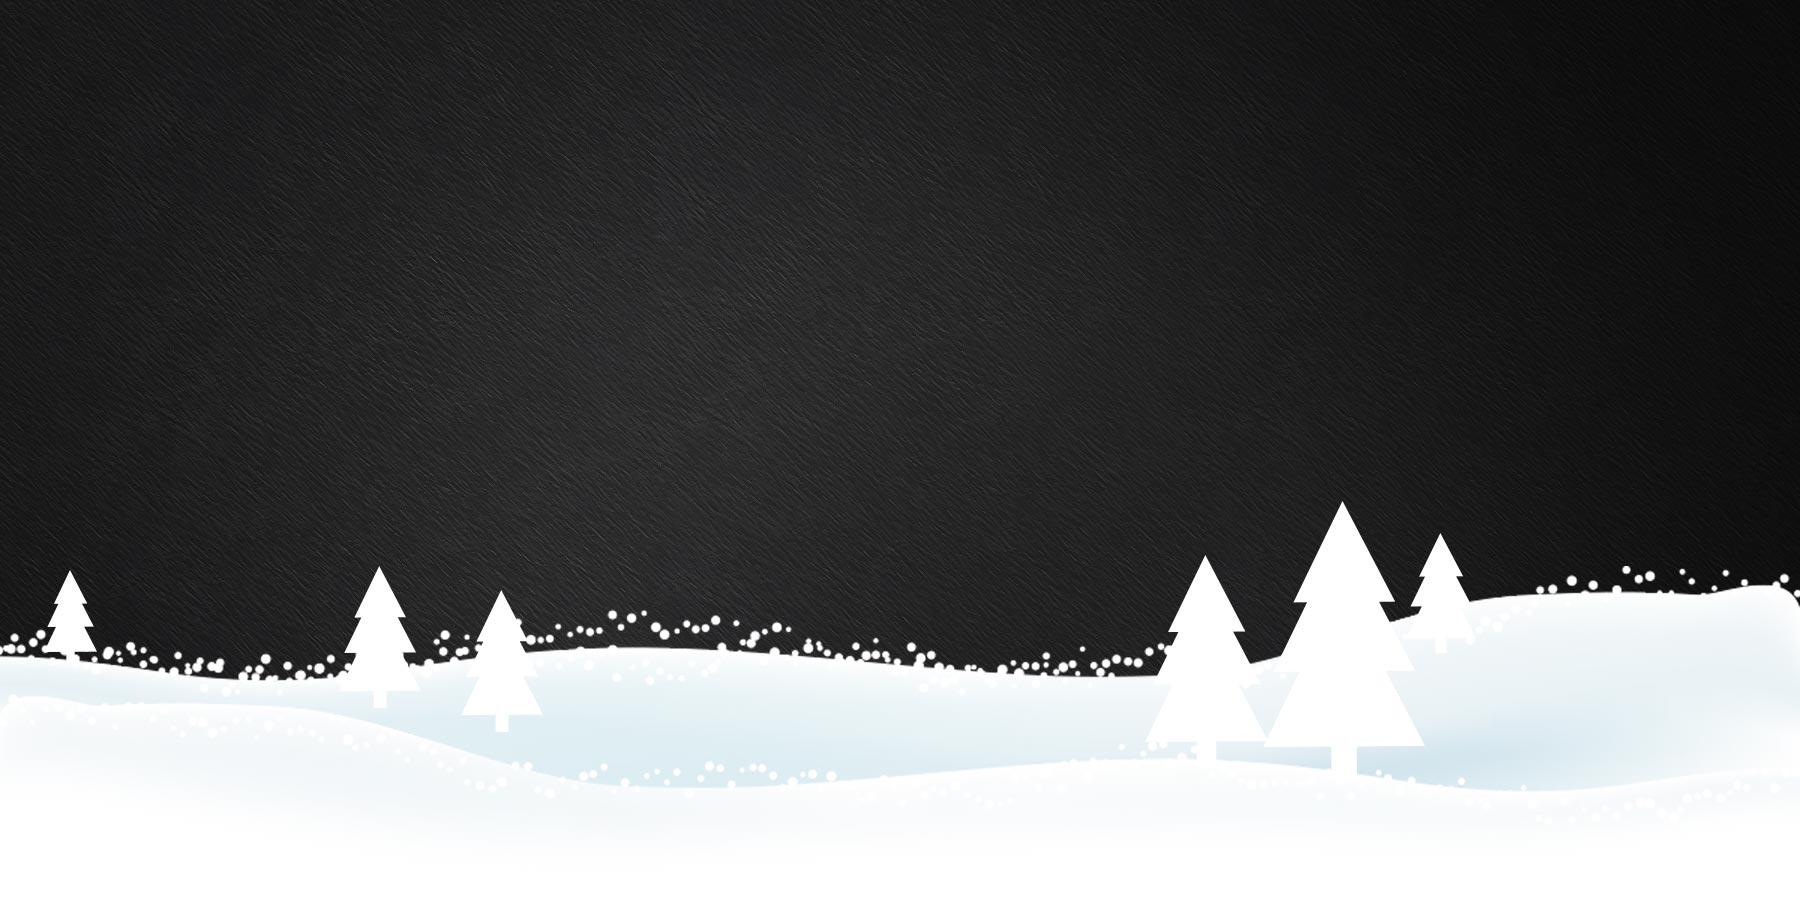 Mizrentals SnowFall Background Image